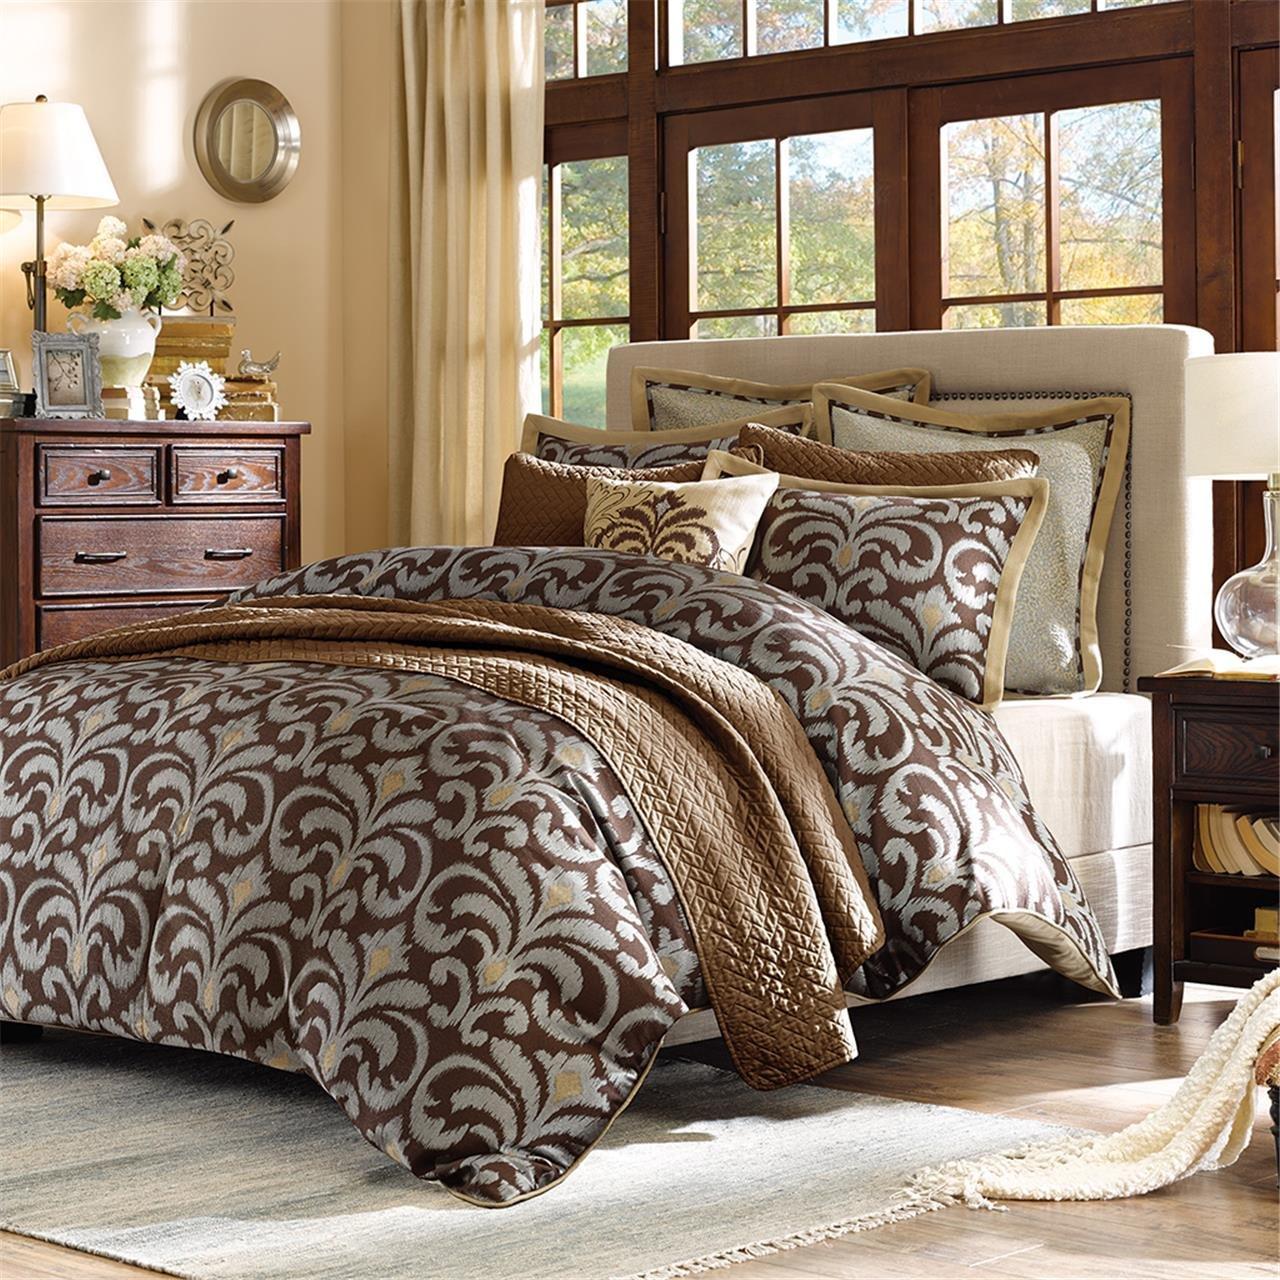 Multicolor JLA Home FB10-938 Hampton Hill Kingsley Comforter Set Full//Queen Multi